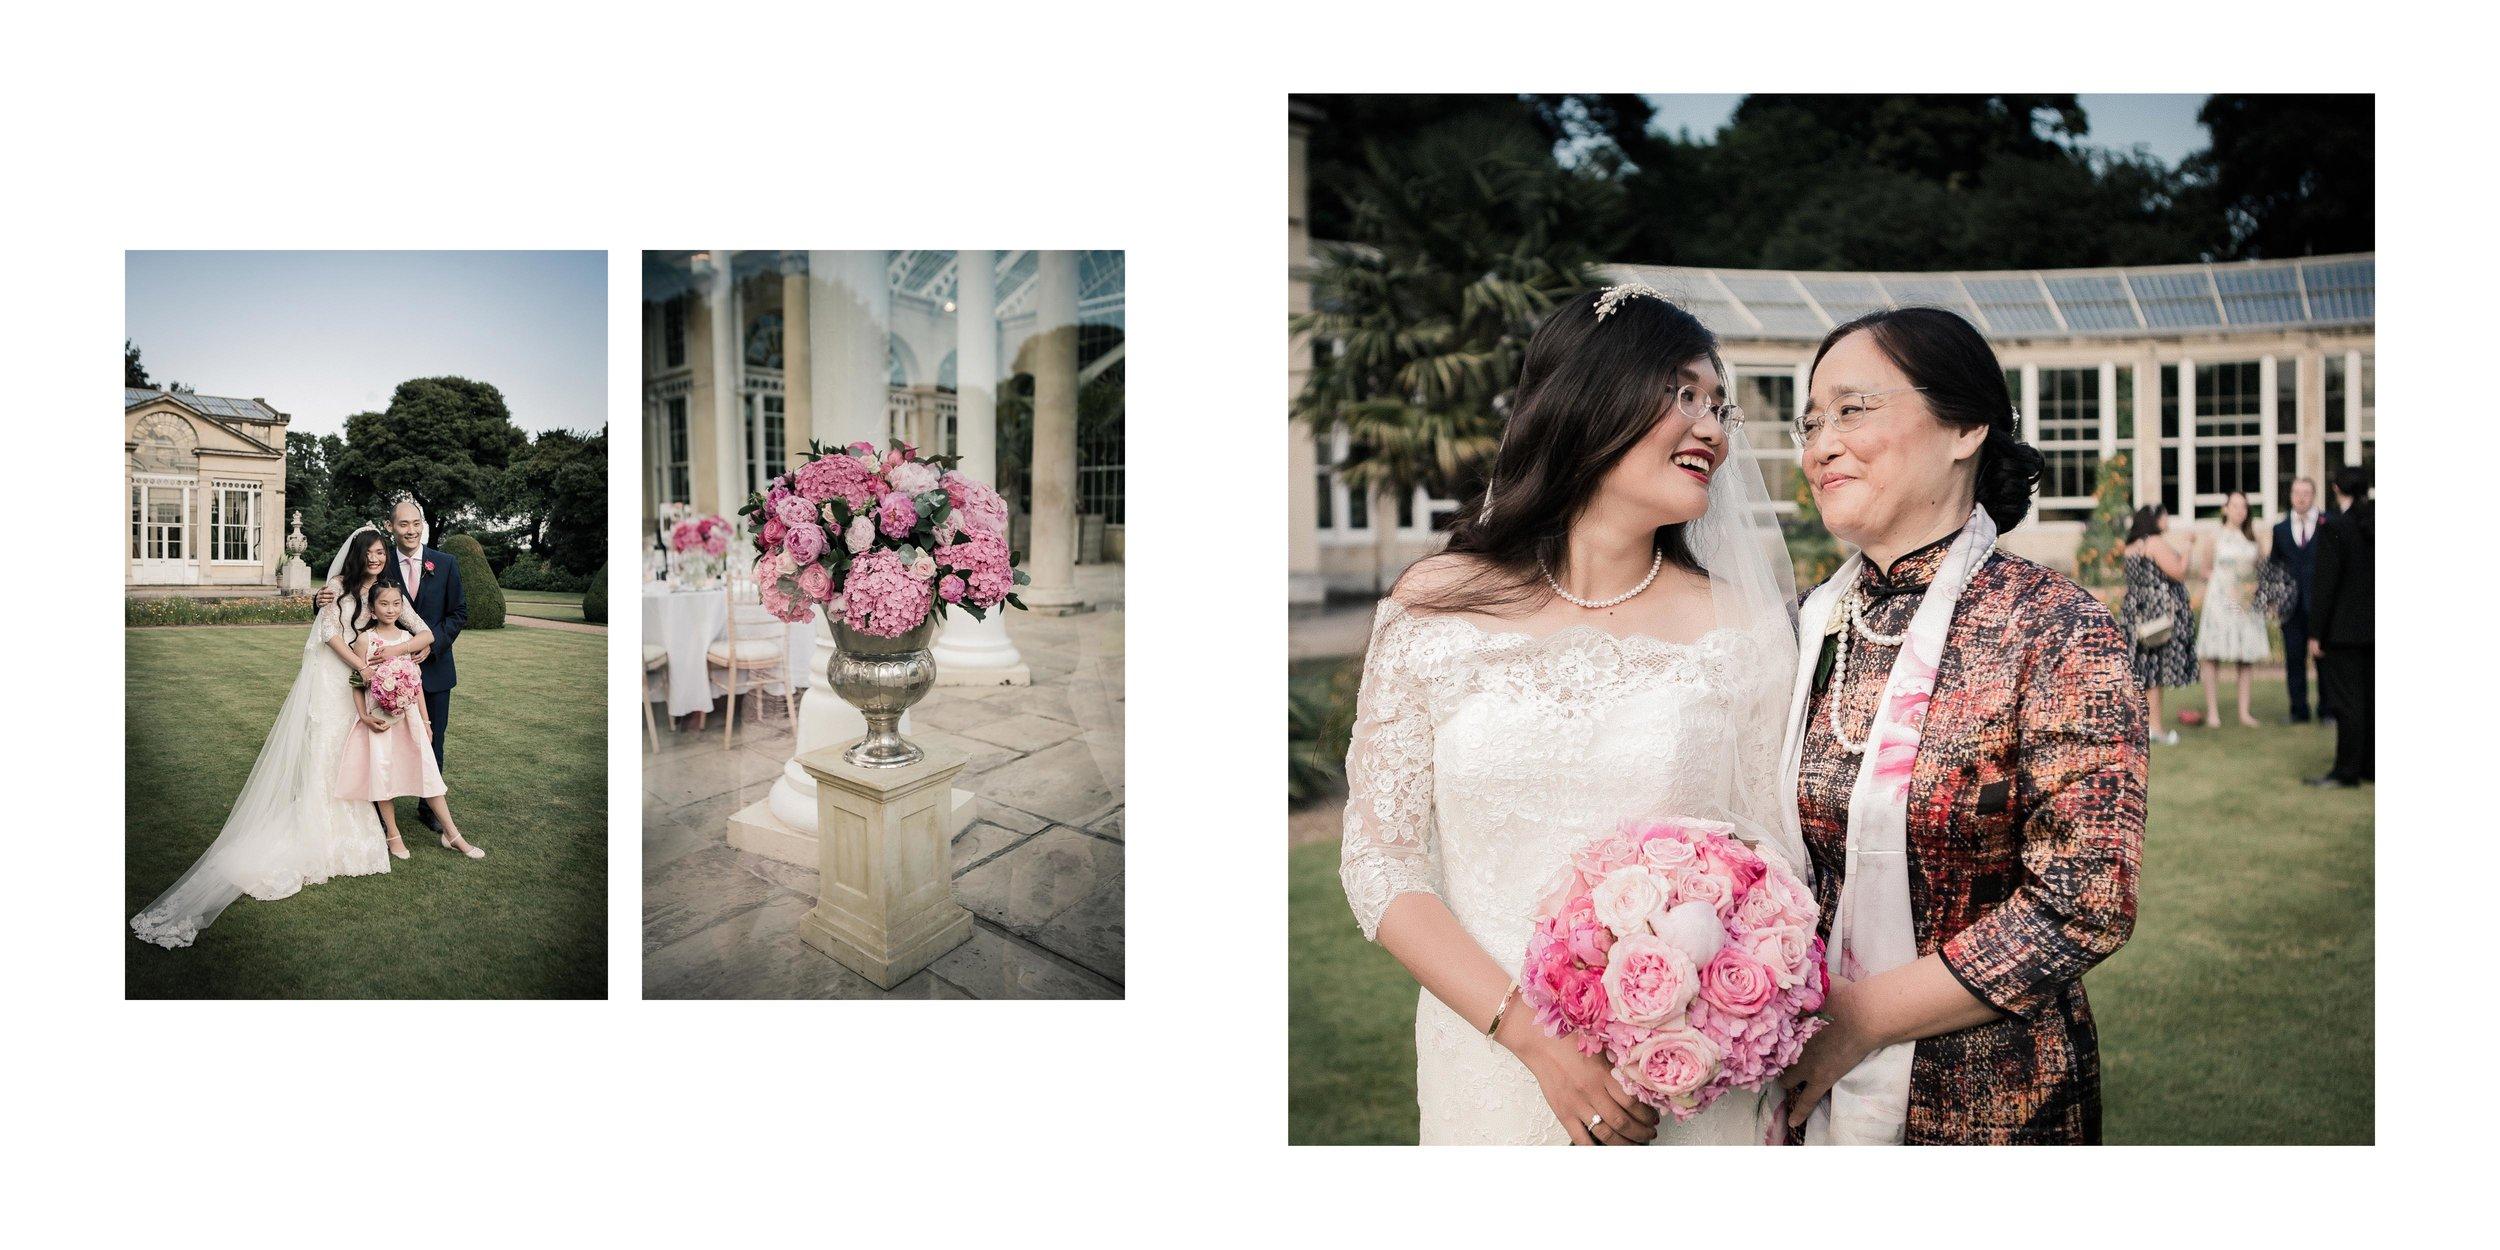 wedding_photographer_surrey_48.jpg